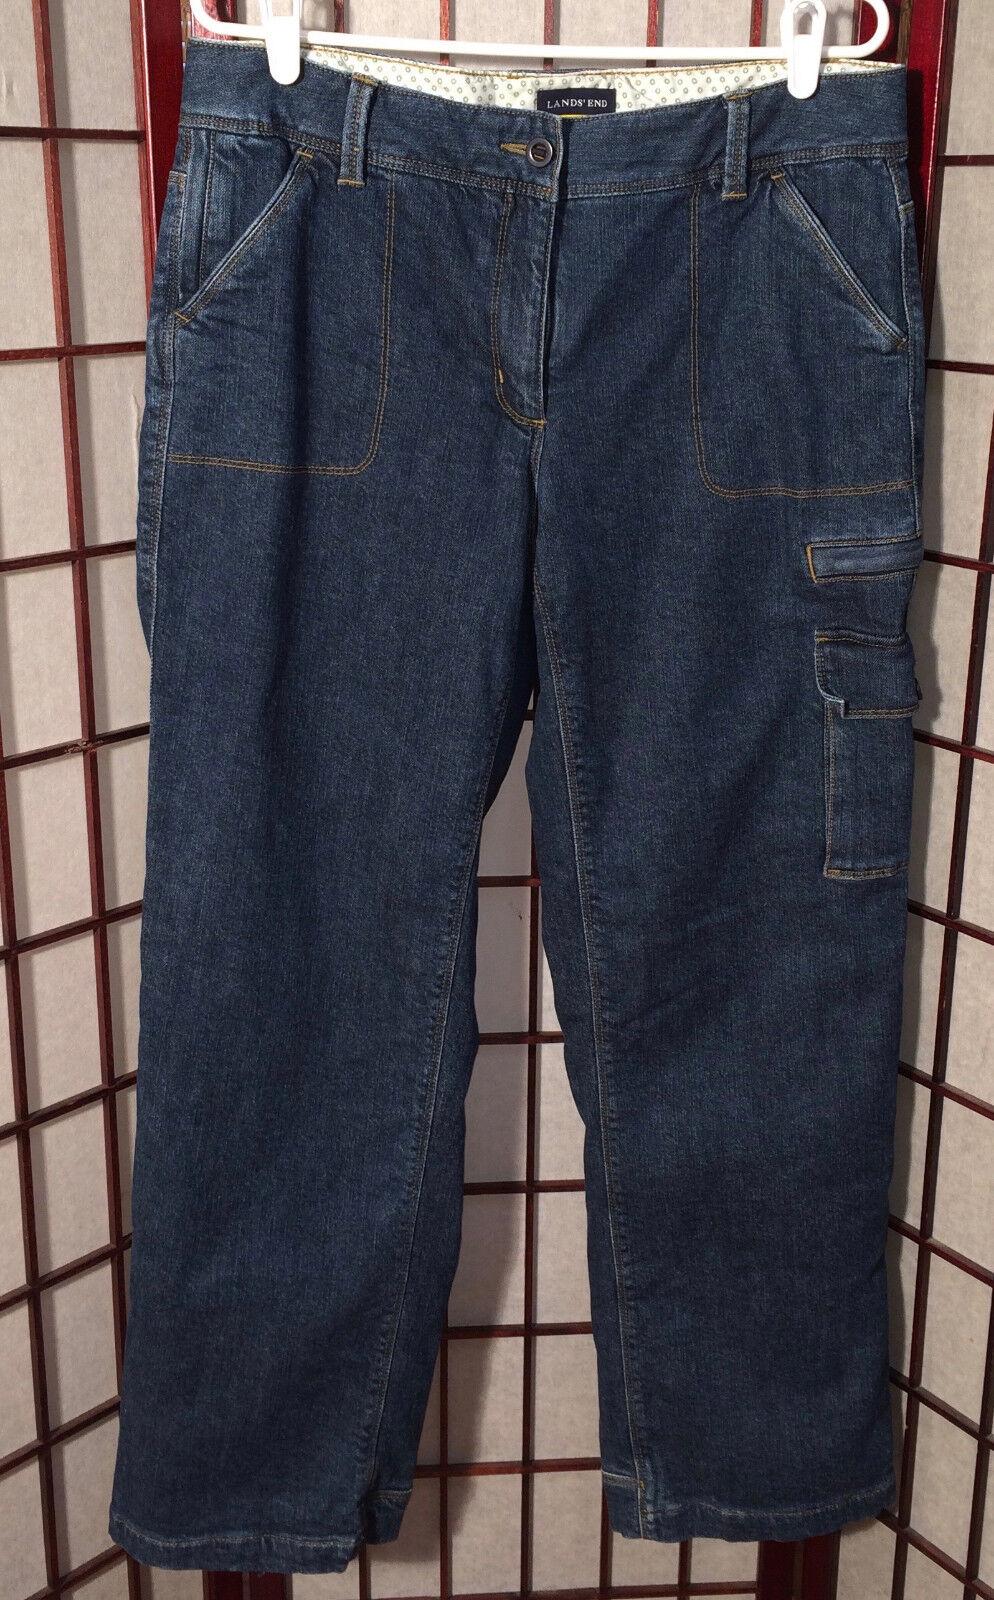 2 Pr Lot LANDS END Women 12 Lined Cargo Pant Brown + Denim Carpenter Jeans Warm